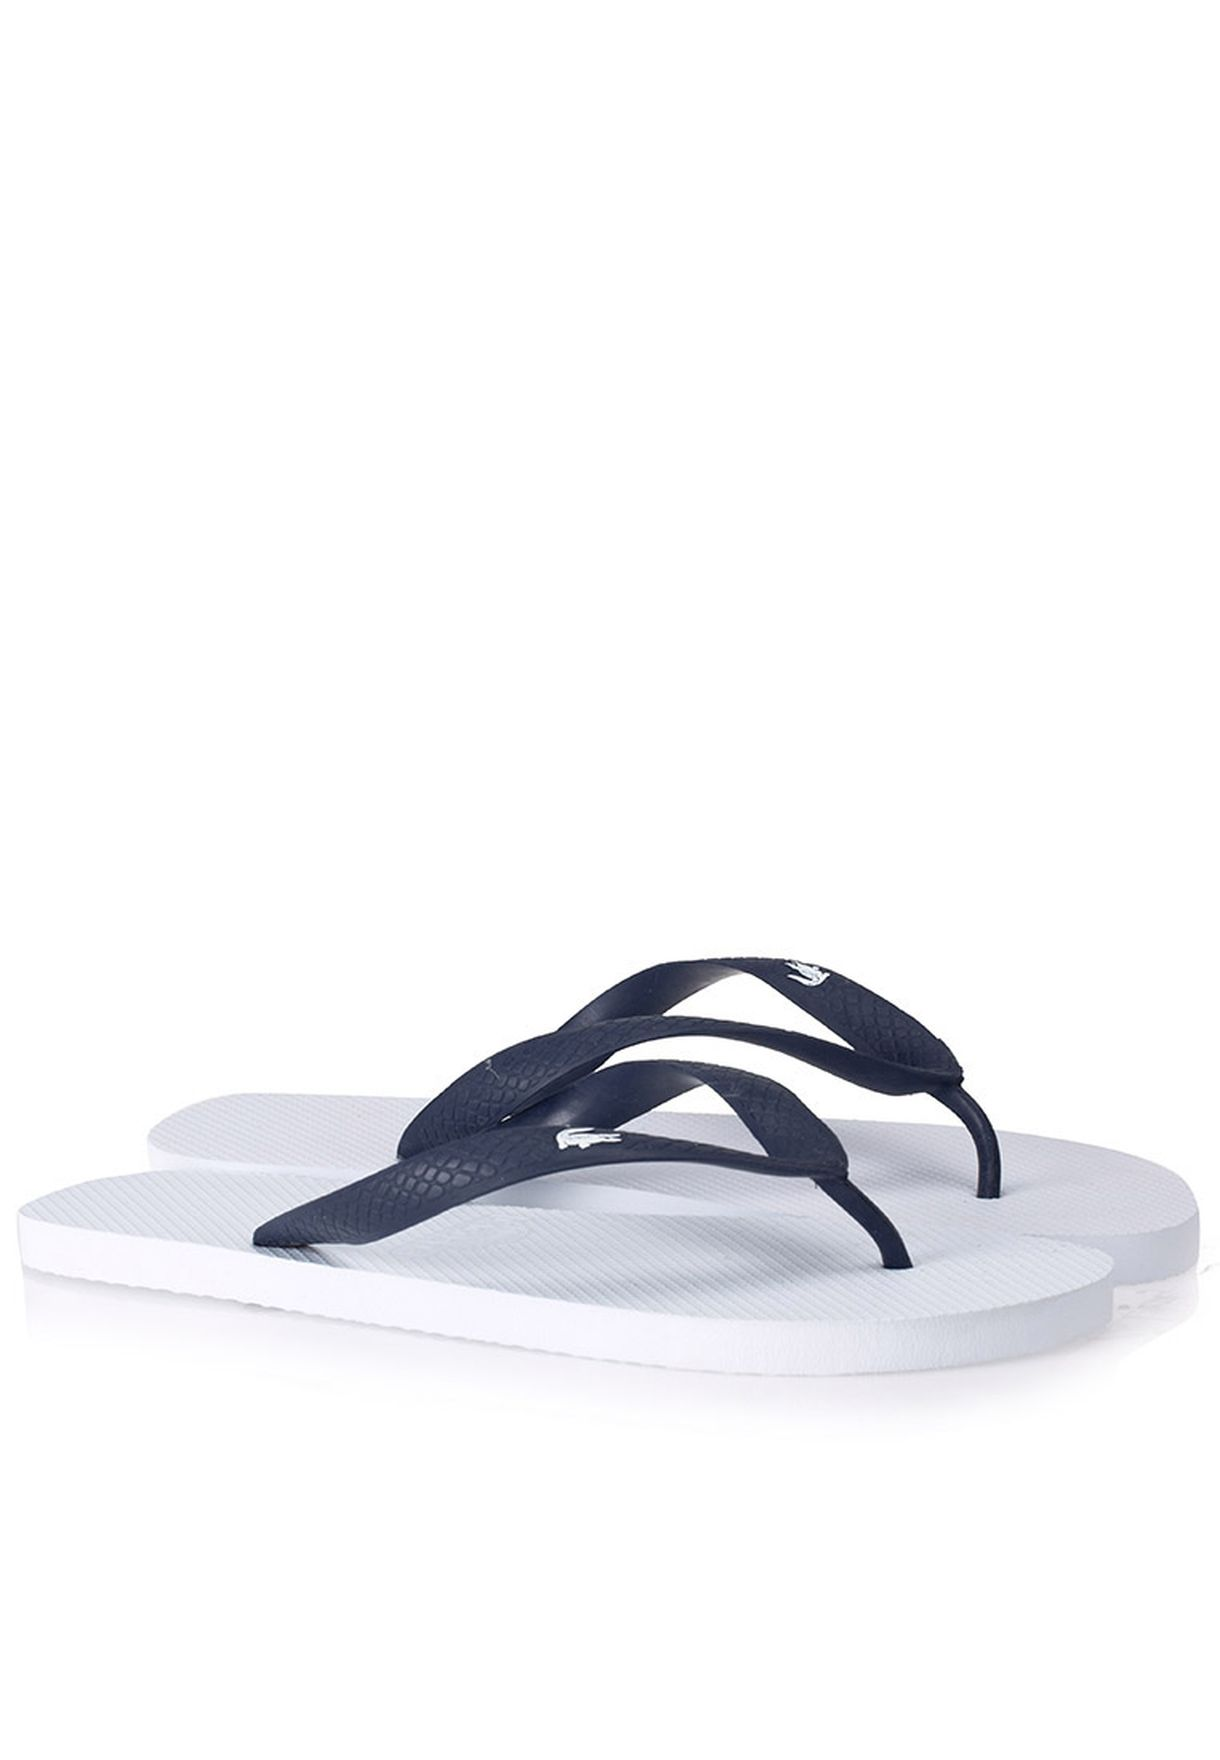 fded3032f1b3 Shop Lacoste white Barona NTE 29SPM0062-121 for Men in Bahrain -  LA014SH29LCC